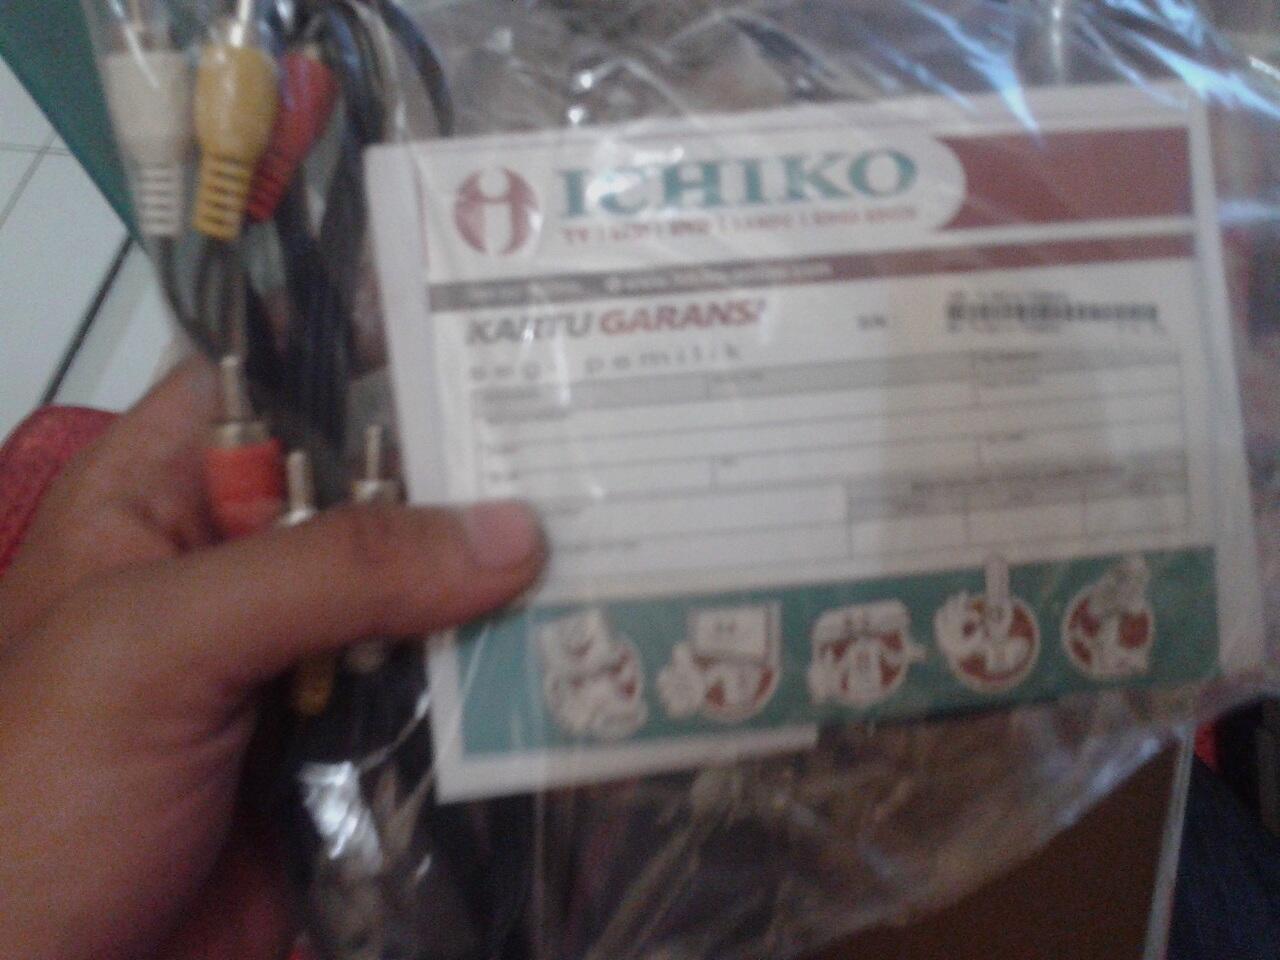 DVD Player Ichiko +USB MURAH BOGOR